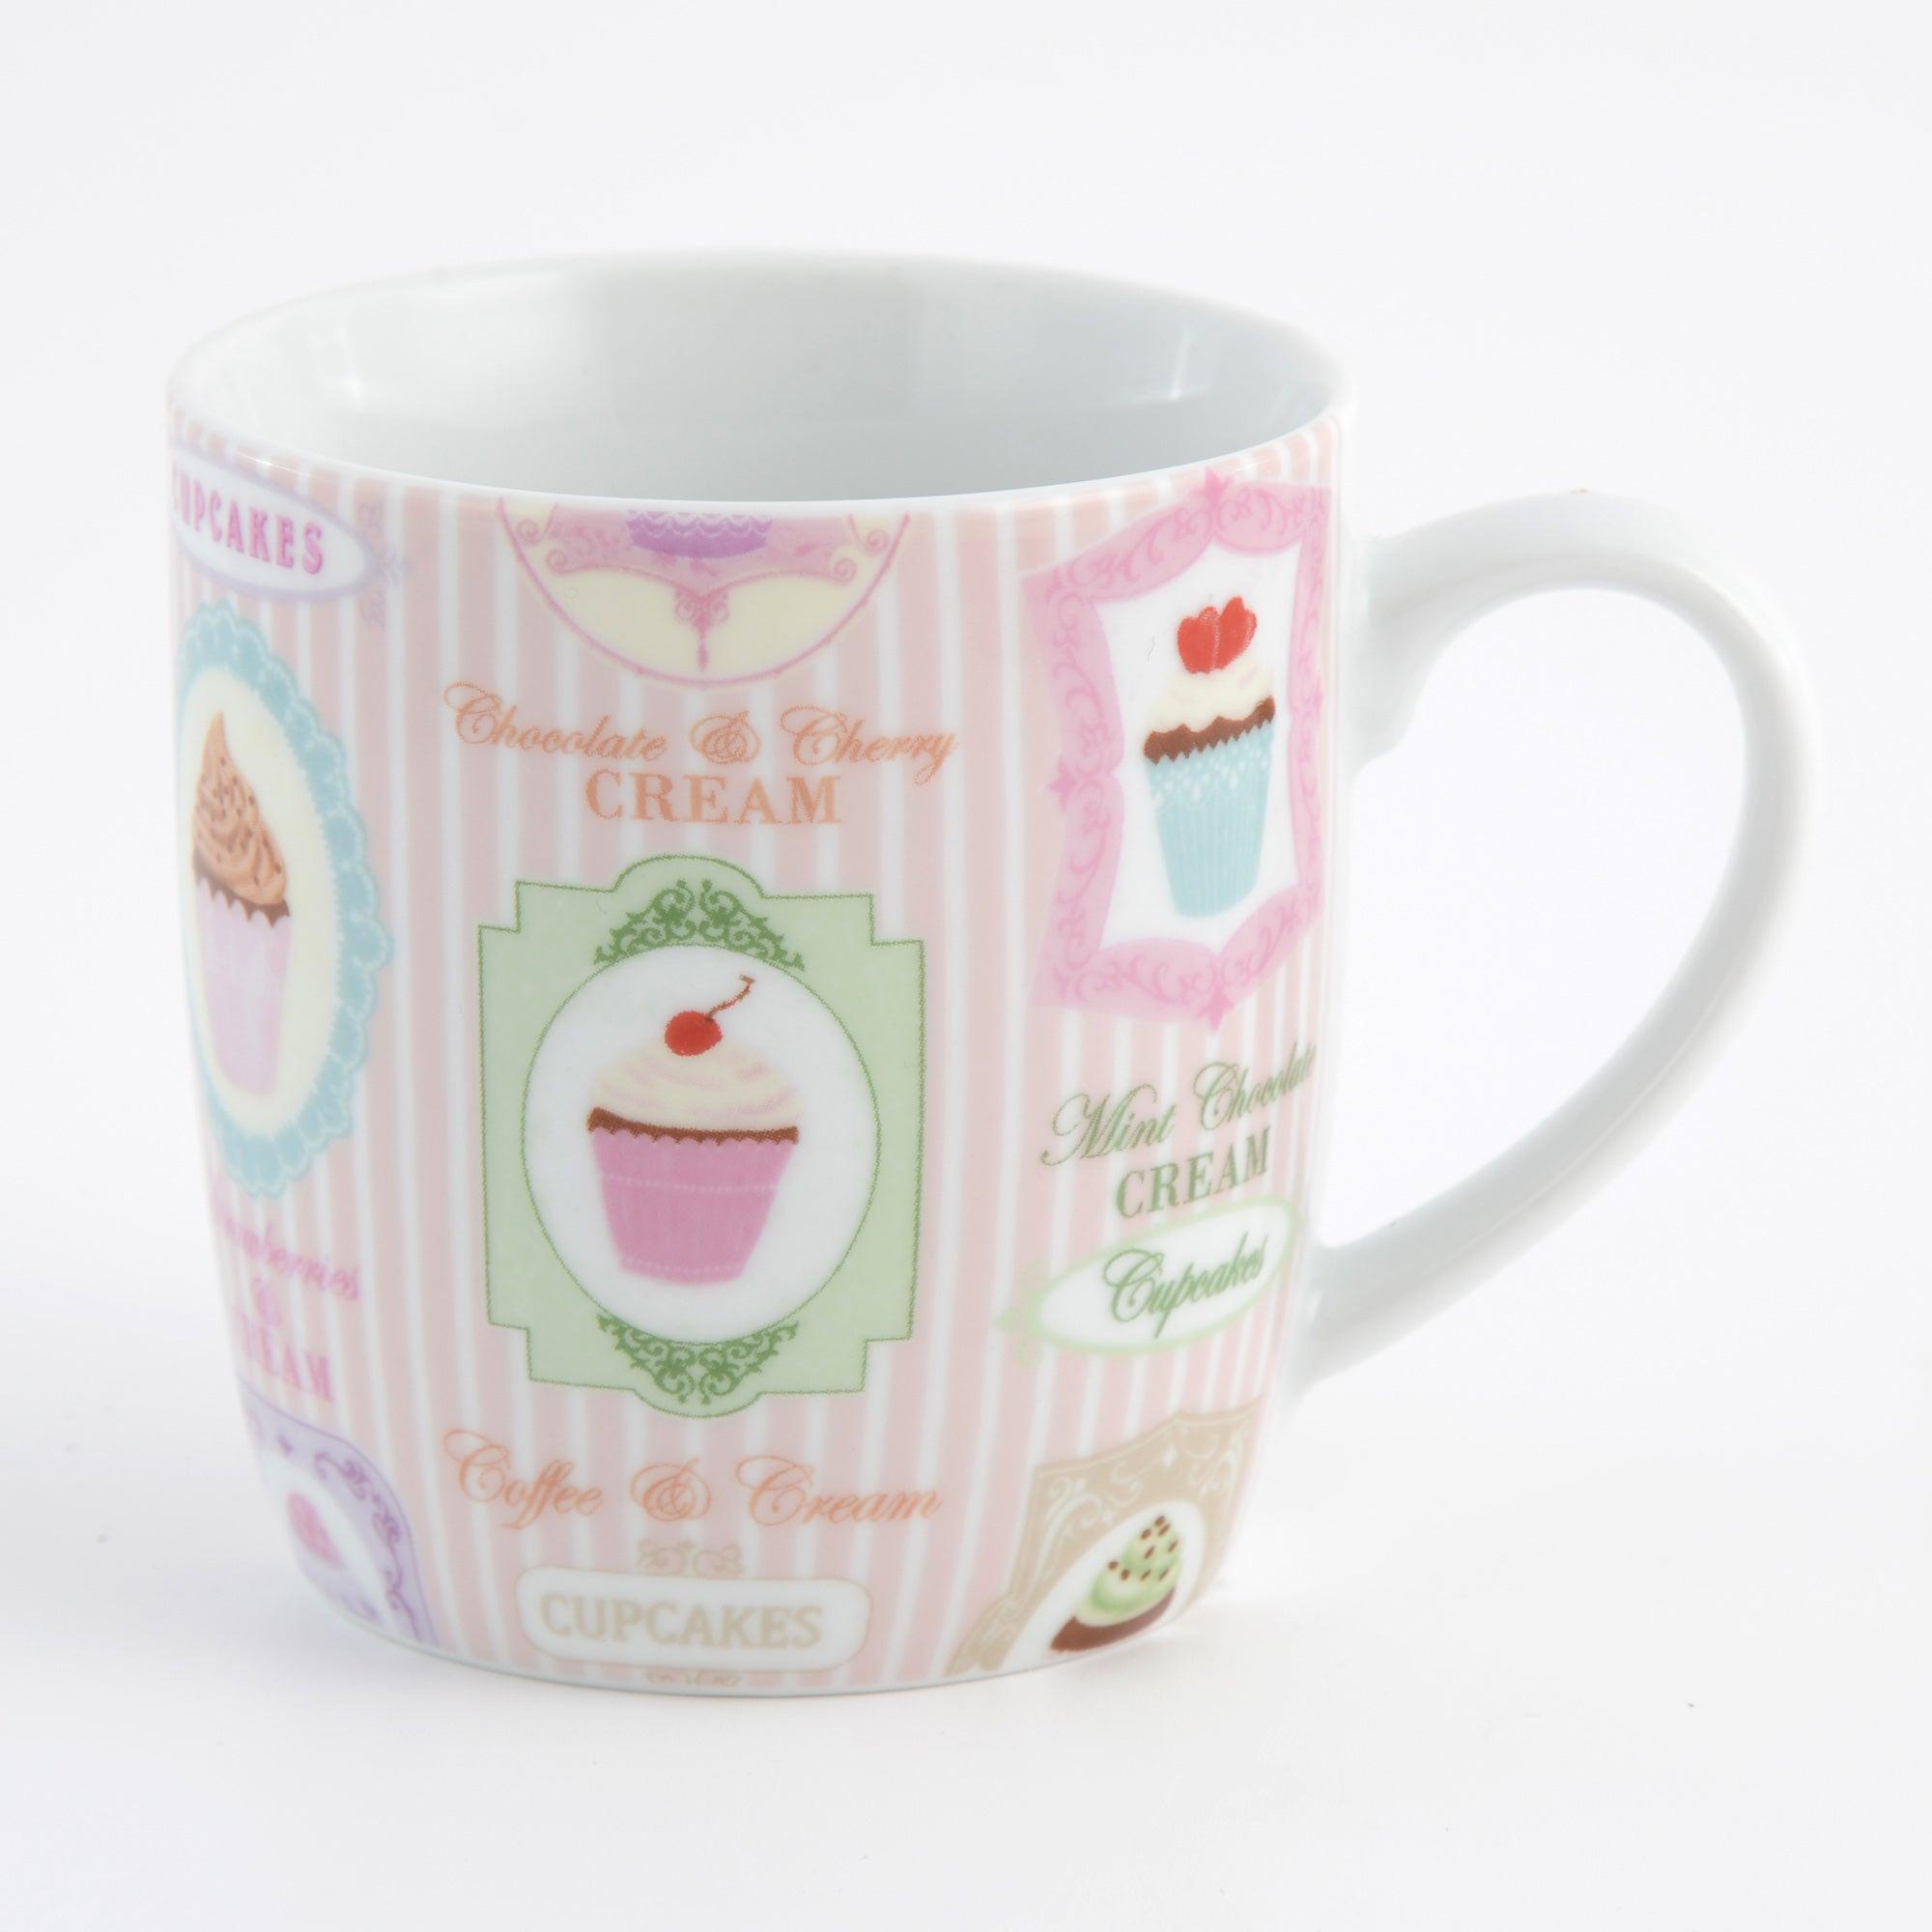 Tea Party Collection Mug